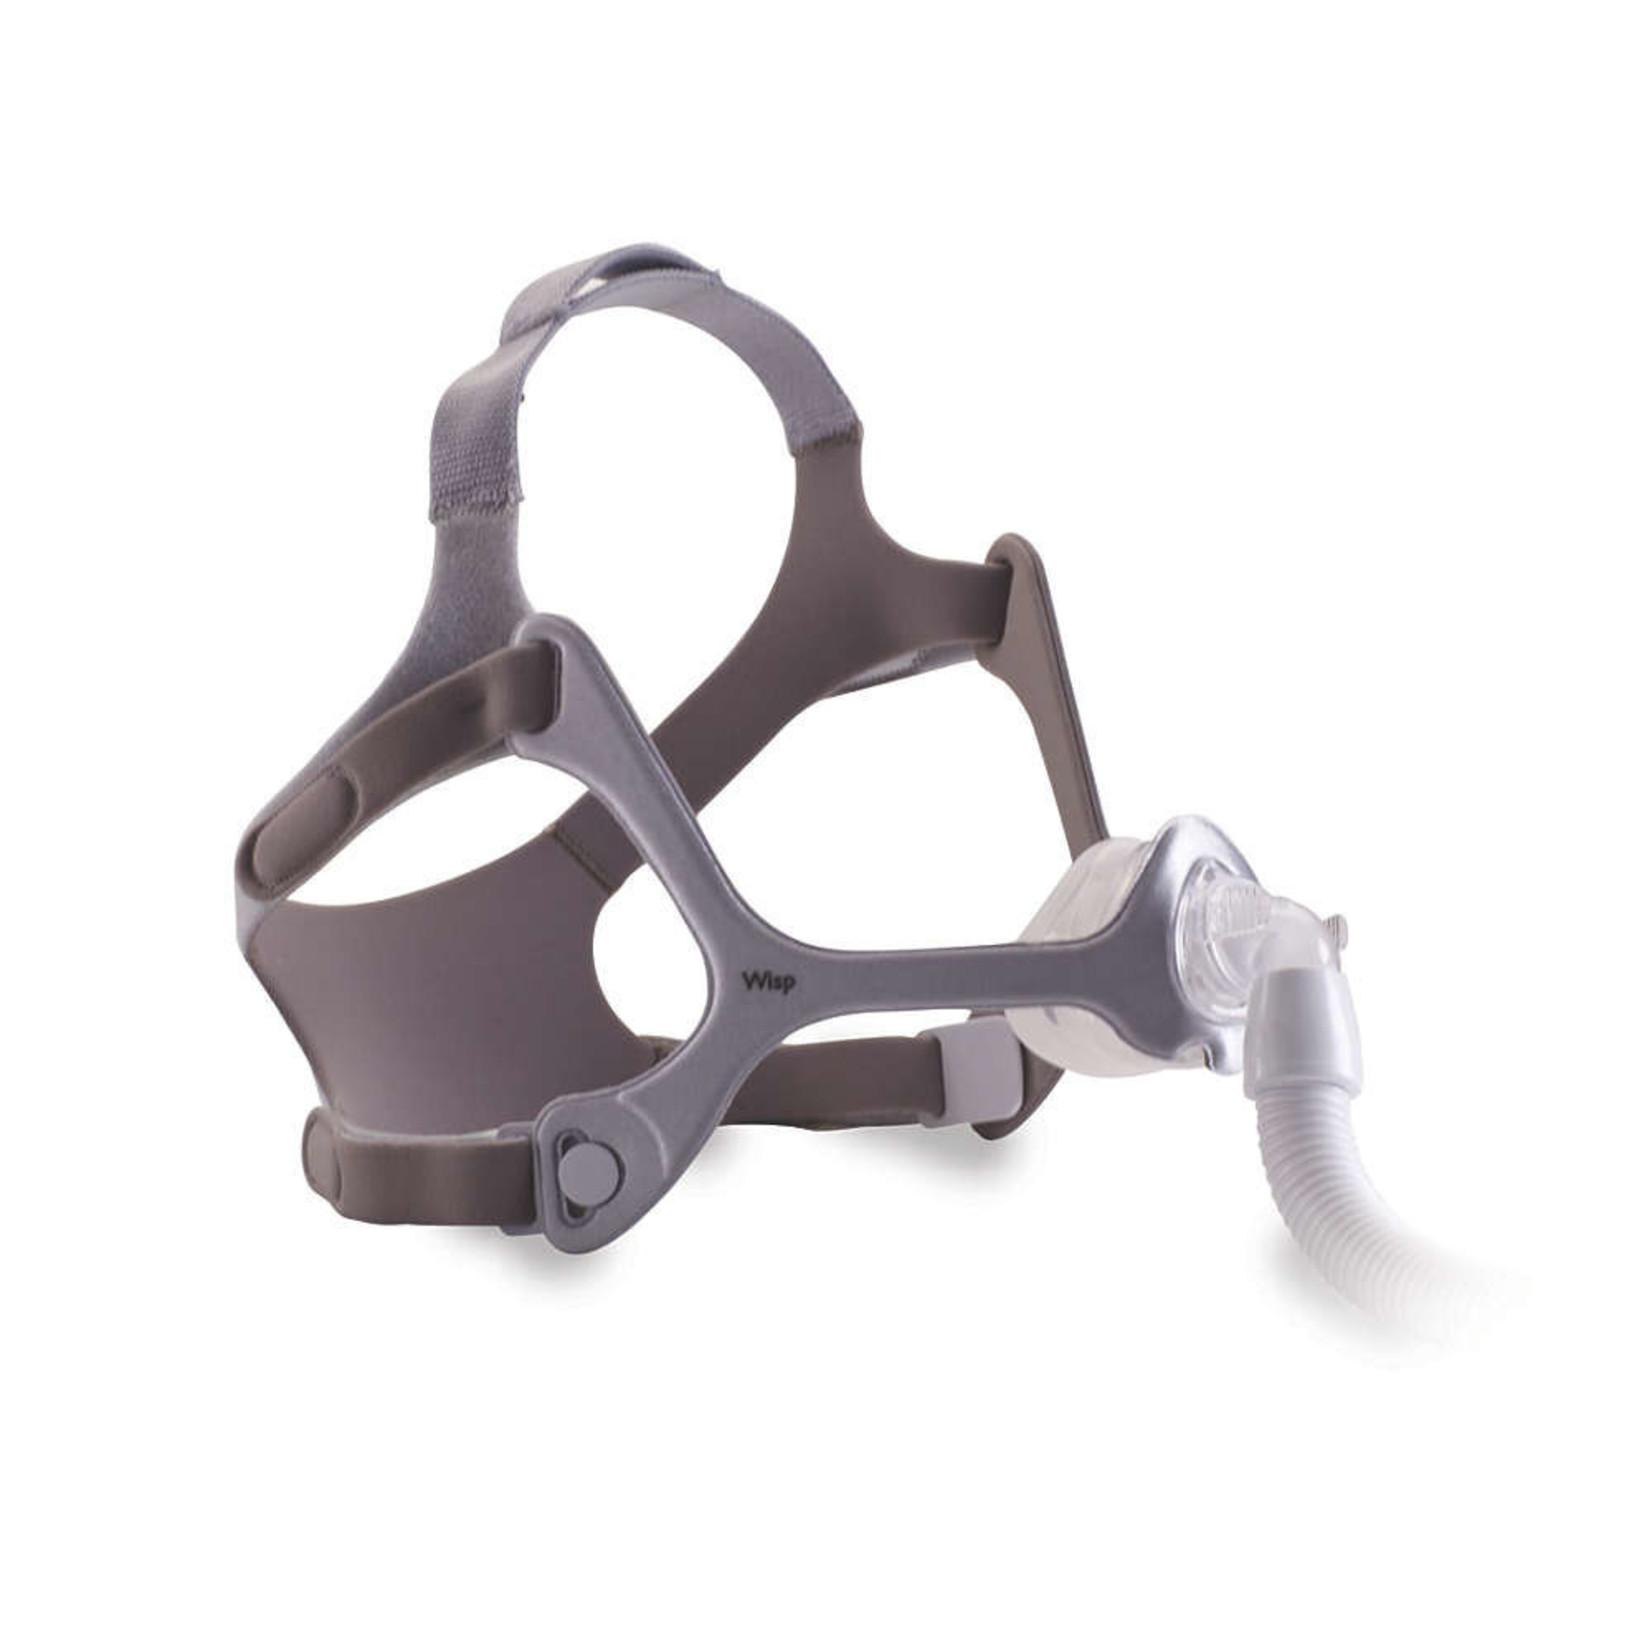 RESPIRONICS Wisp Nasal CPAP Mask w/Headgear